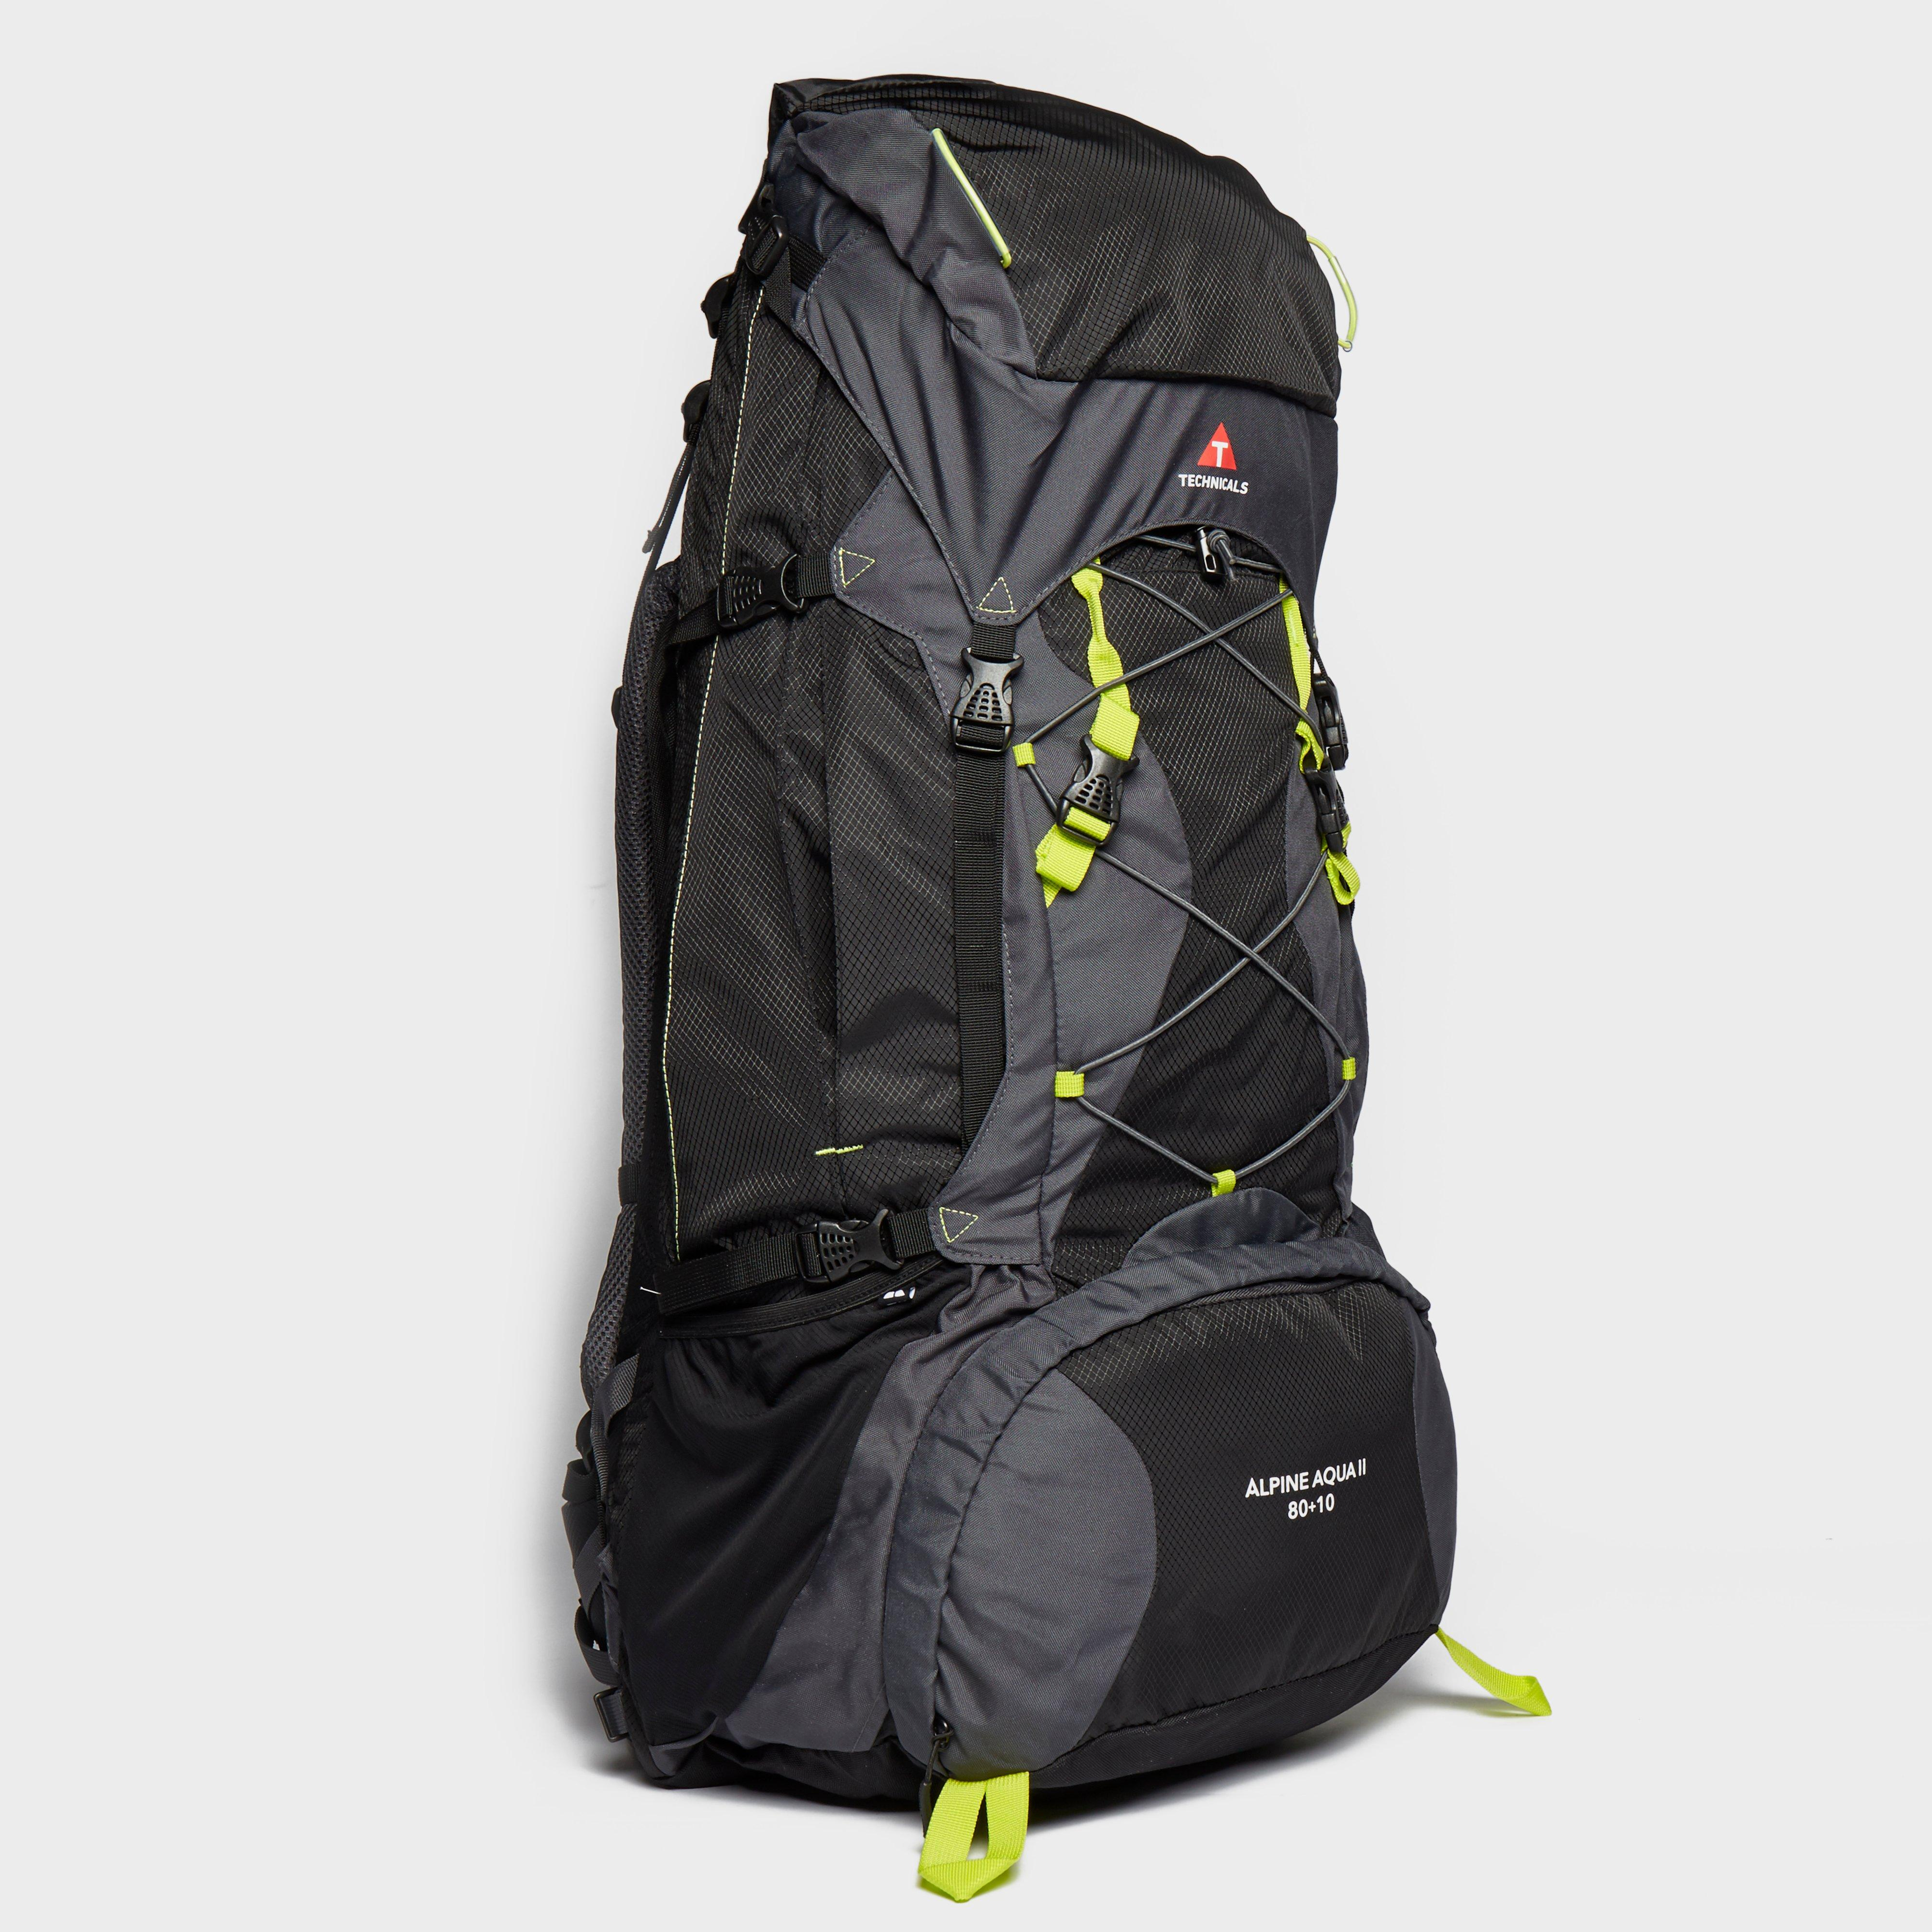 Popular Hiking Clothing Brands